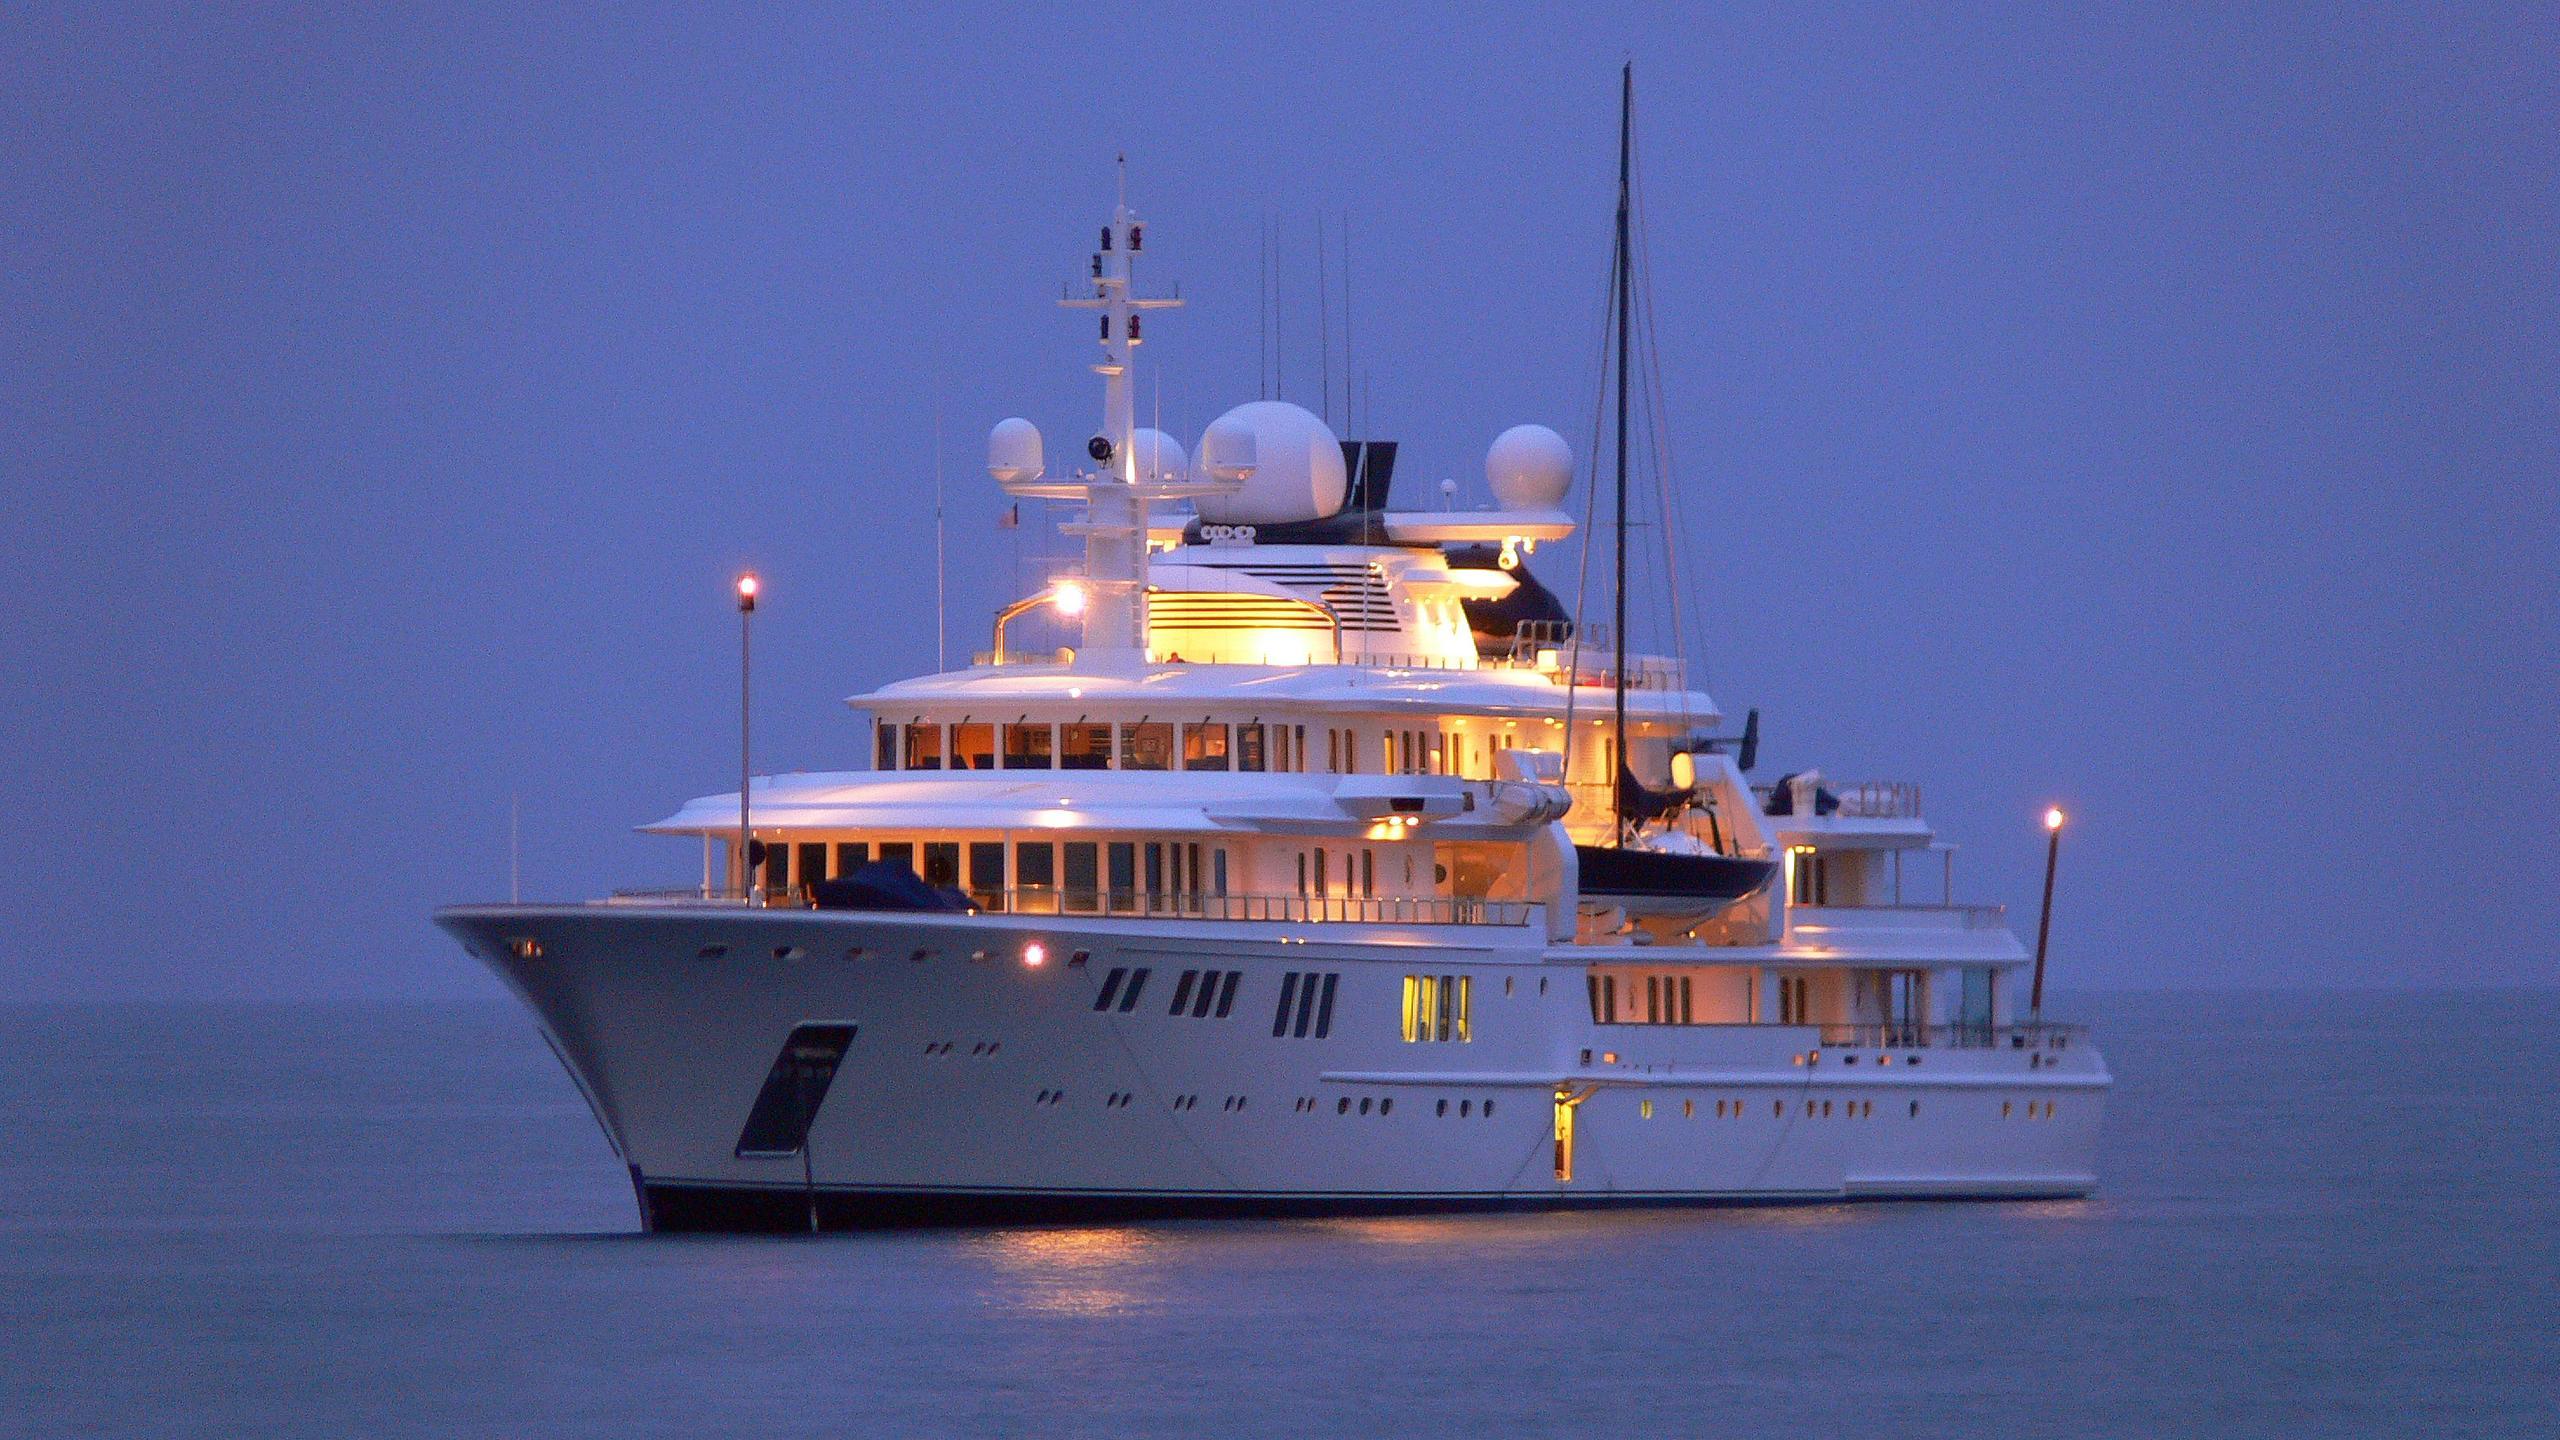 tatoosh-motor-yacht-nobiskrug-2000-92m-bow-by-night